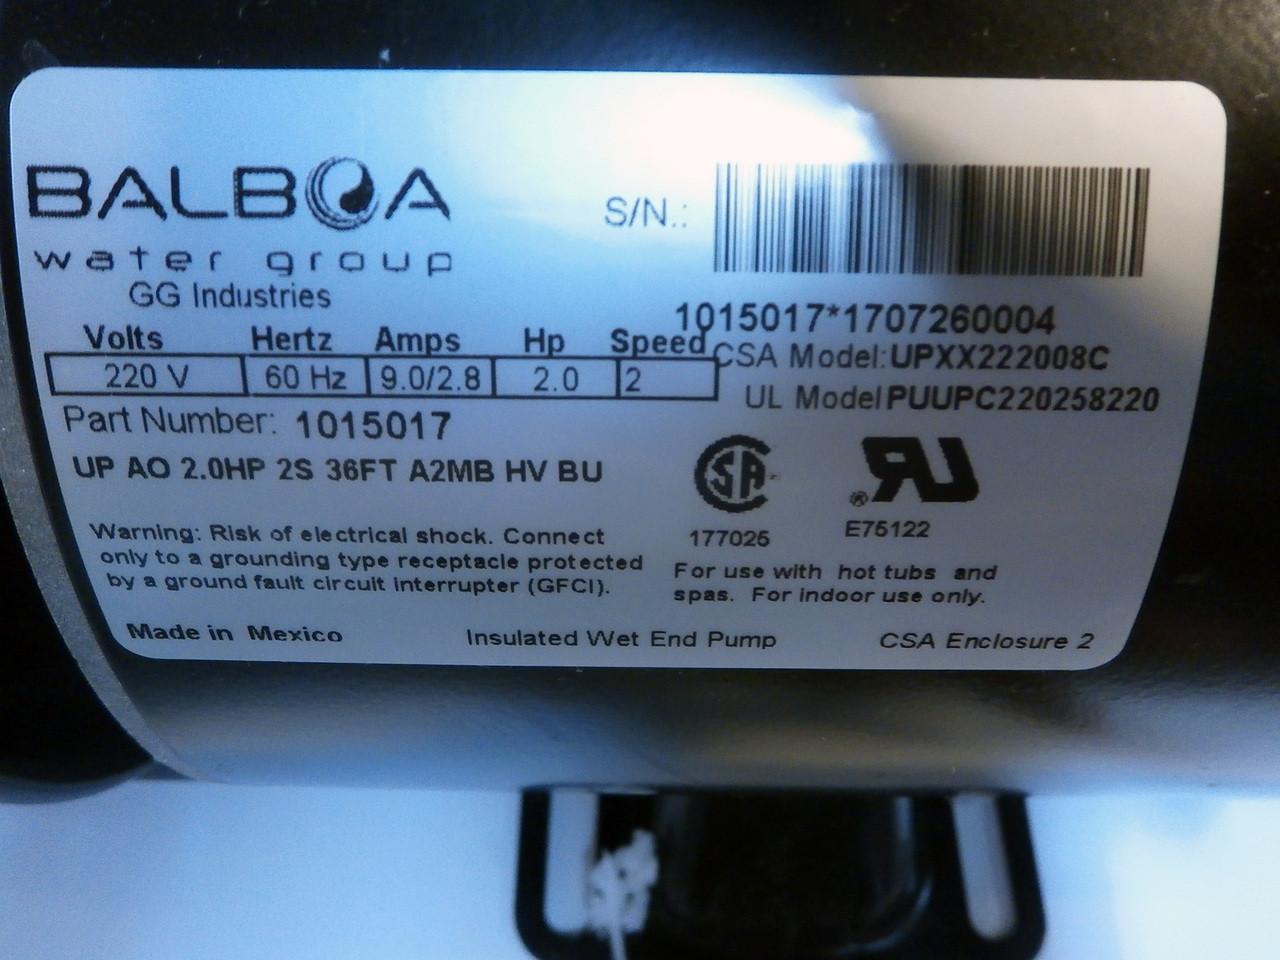 X320465 - Balboa Label View